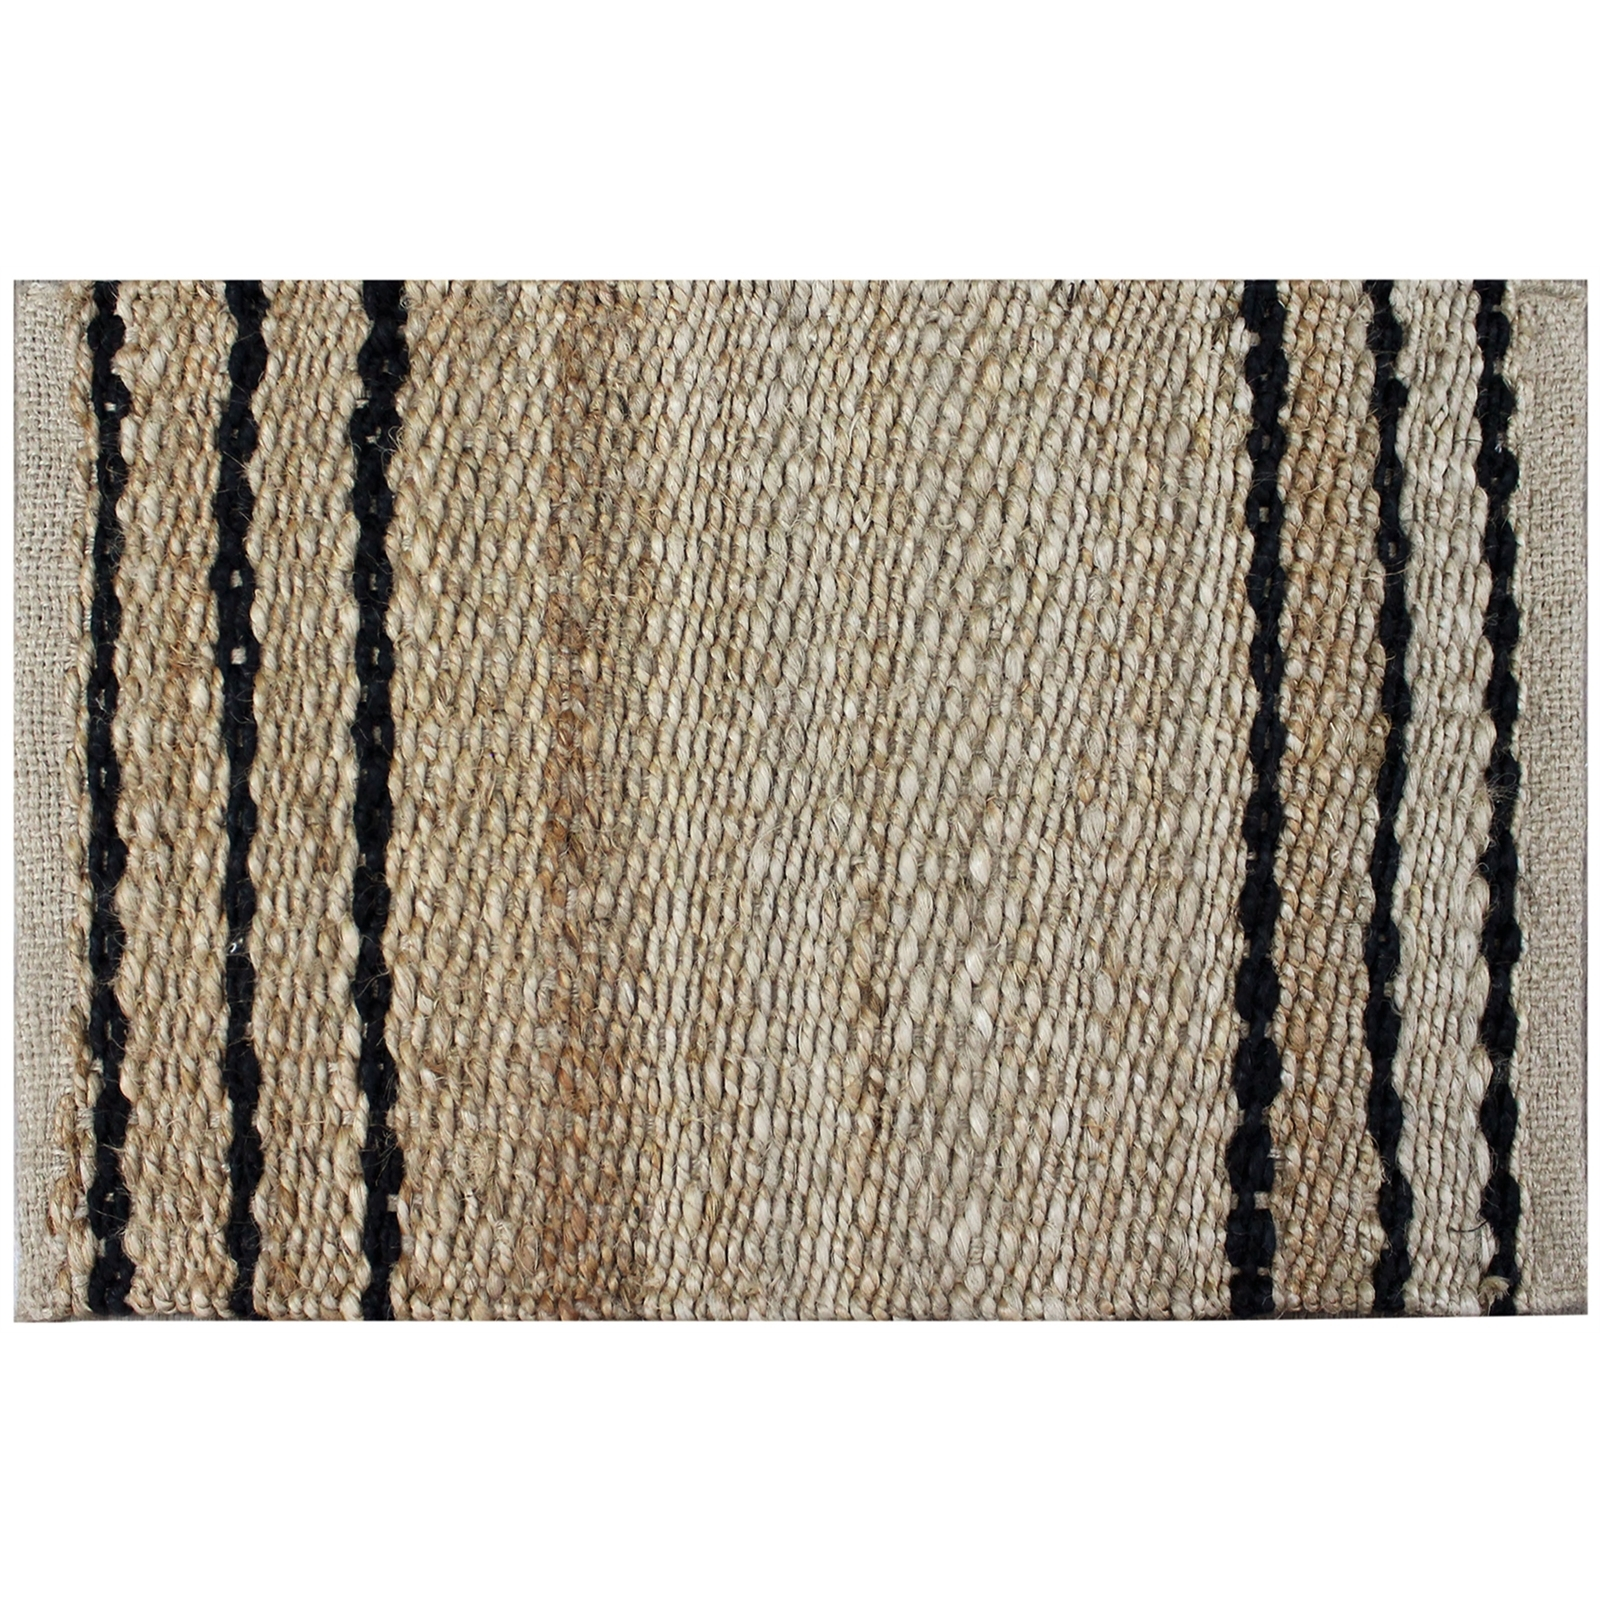 Home Bazar 60 x 40cm Black Stripes Hamptons Jute Mat